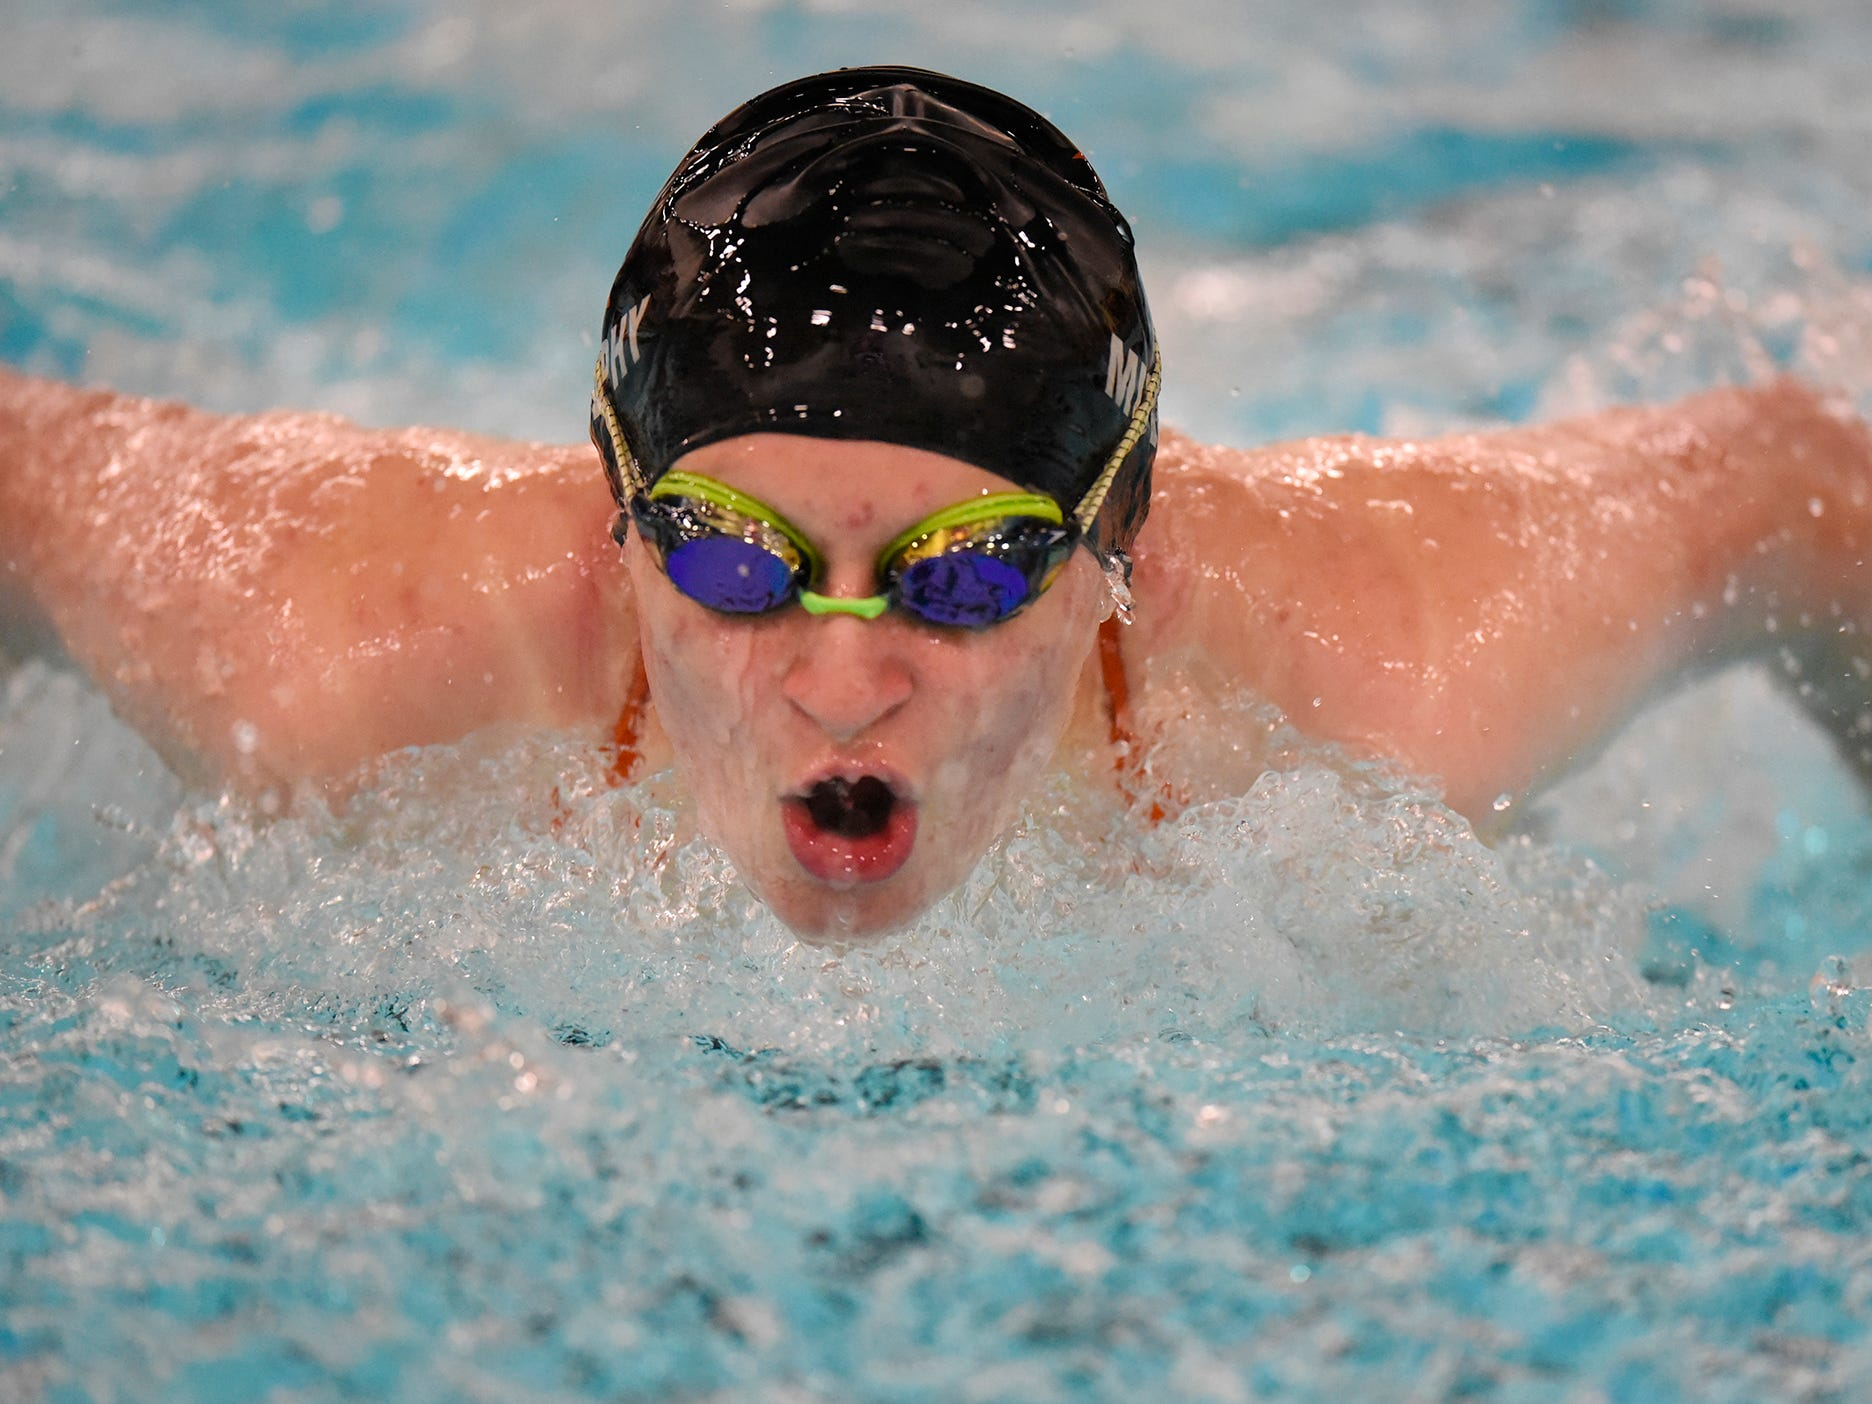 Alaina Murphy powers through her swim during the Tuesday, Sept. 18 meet against Buffalo at Tech High School in St. Cloud.